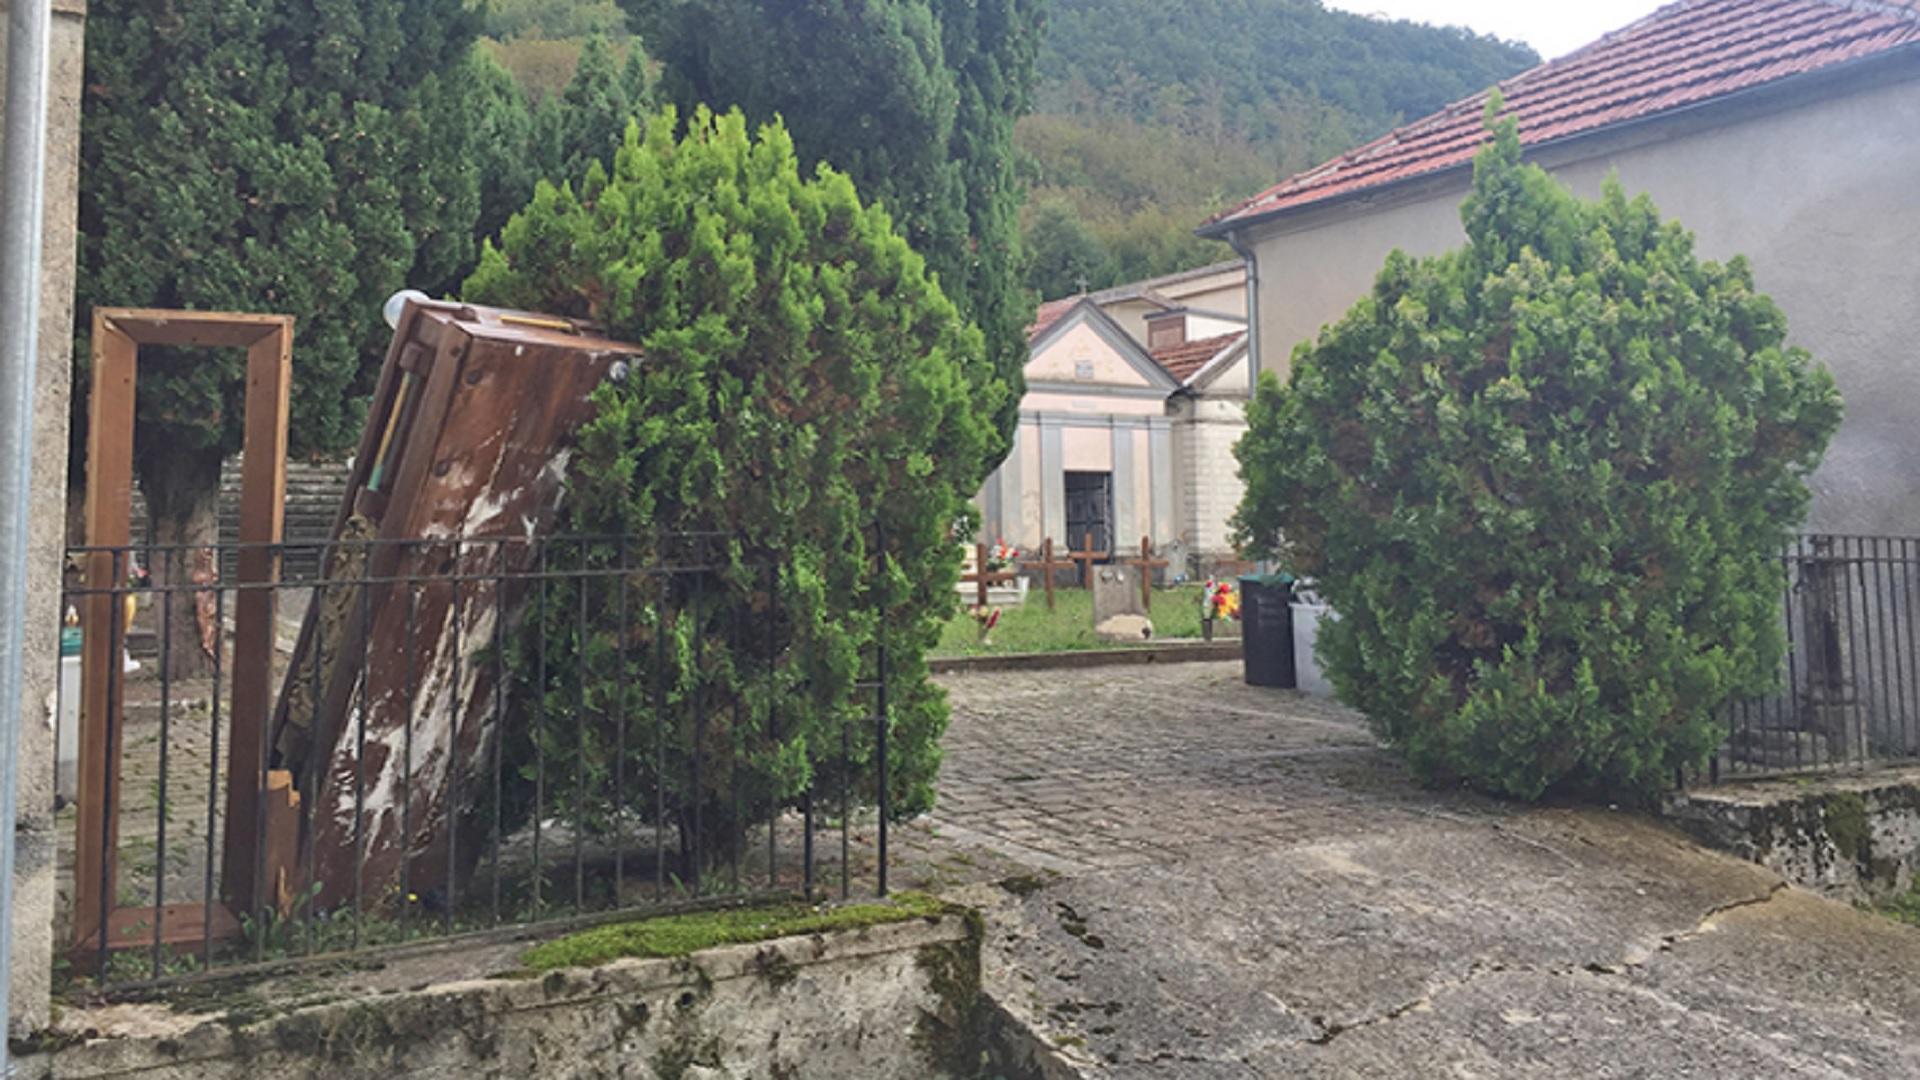 cimitero buonabitacolo